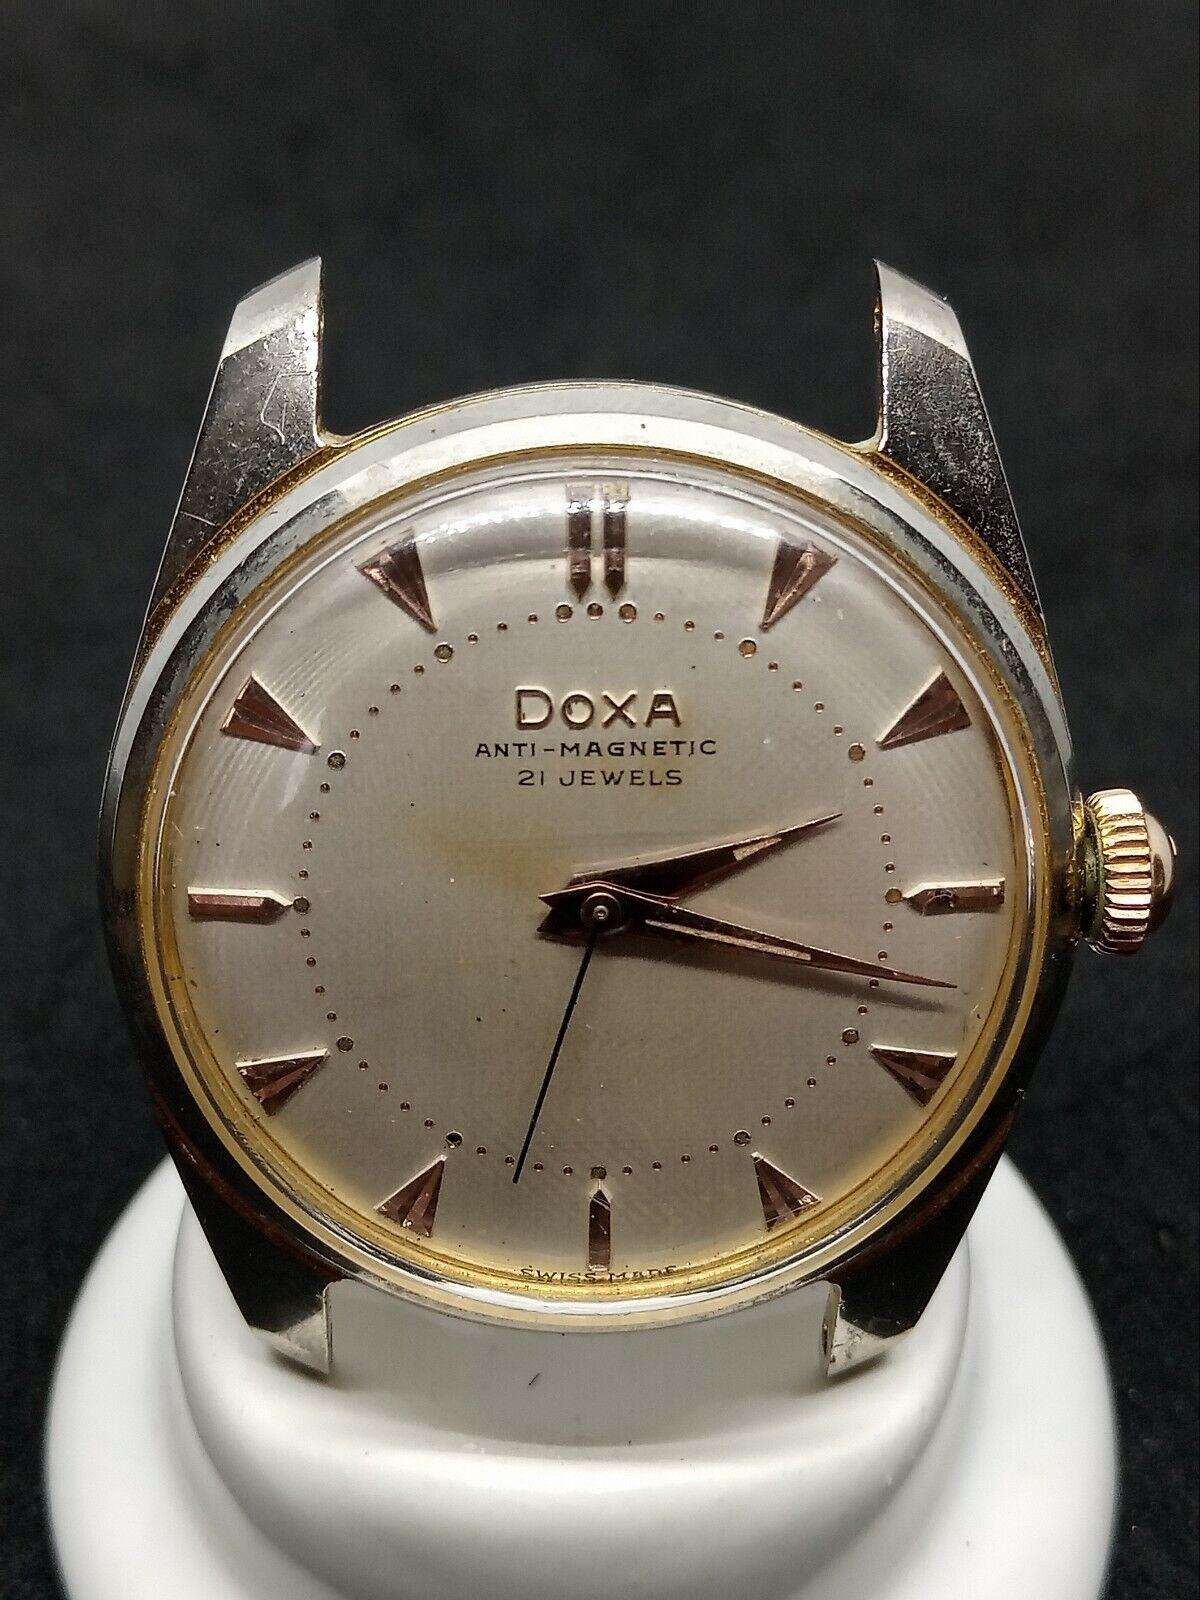 Bild 1 - DOXA CHEZARD CAL 116 circa 1950s